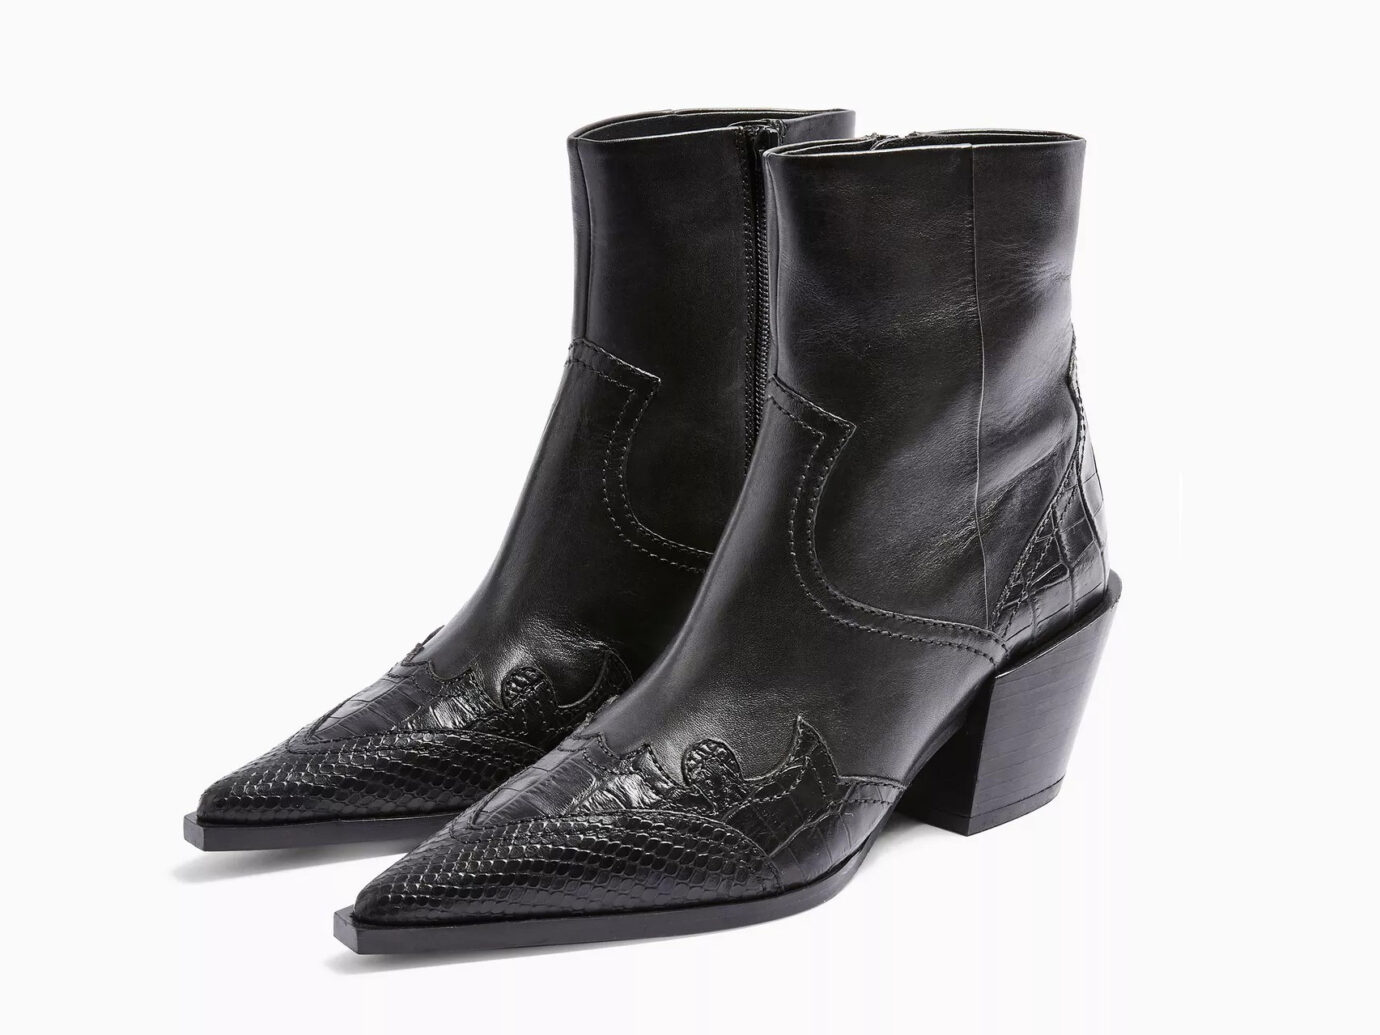 MISSOURI Black Leather Western Boots